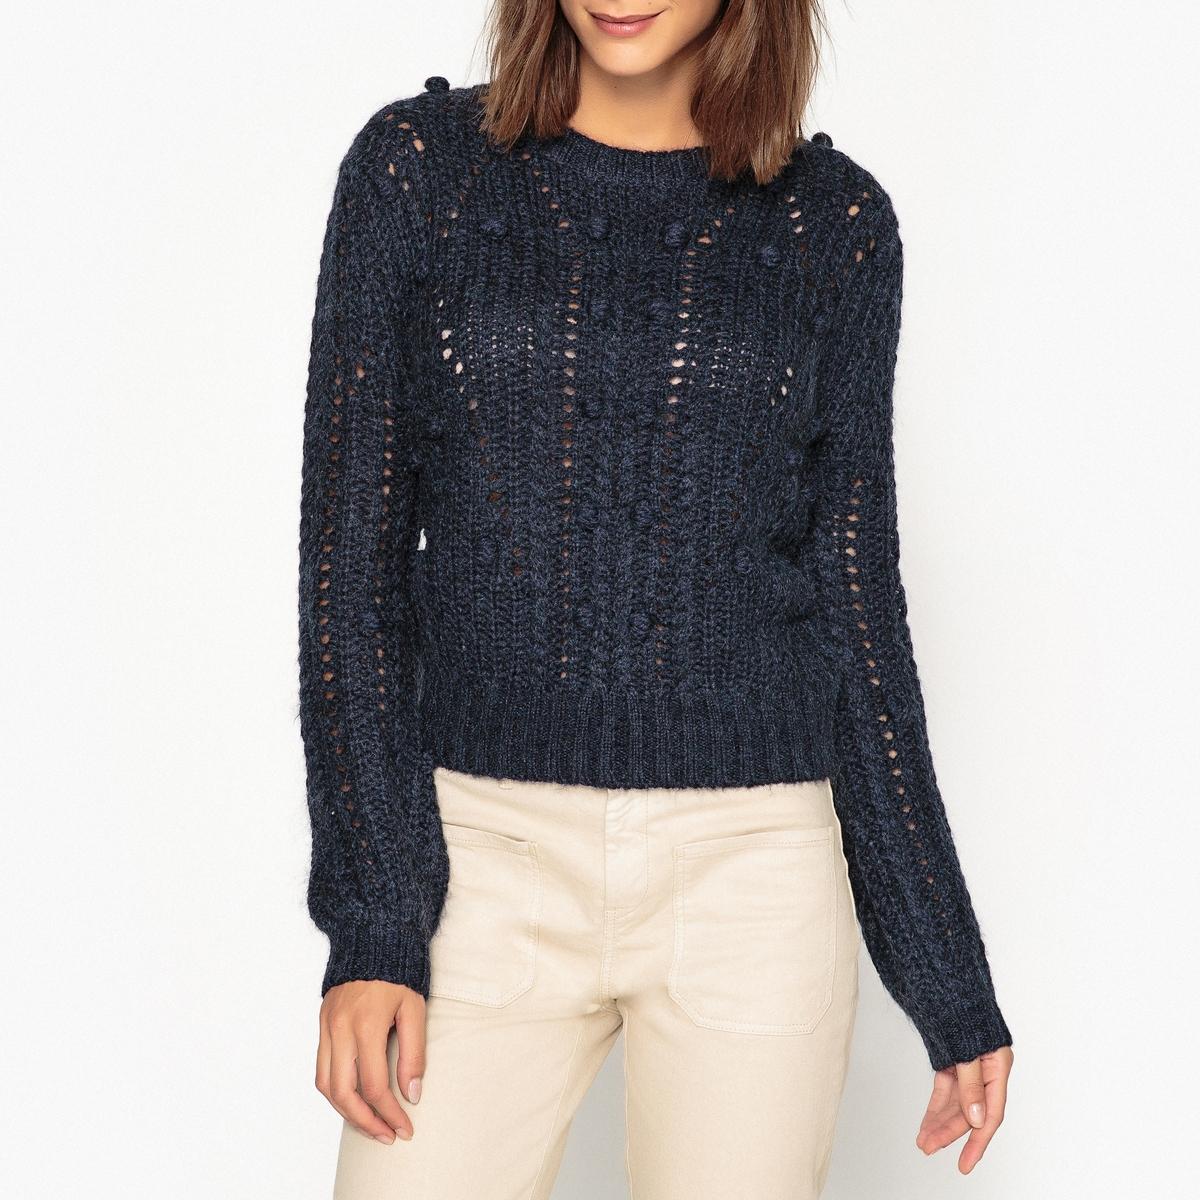 Пуловер La Redoute С круглым вырезом из трикотажа MARTI MA M синий marti pellow york